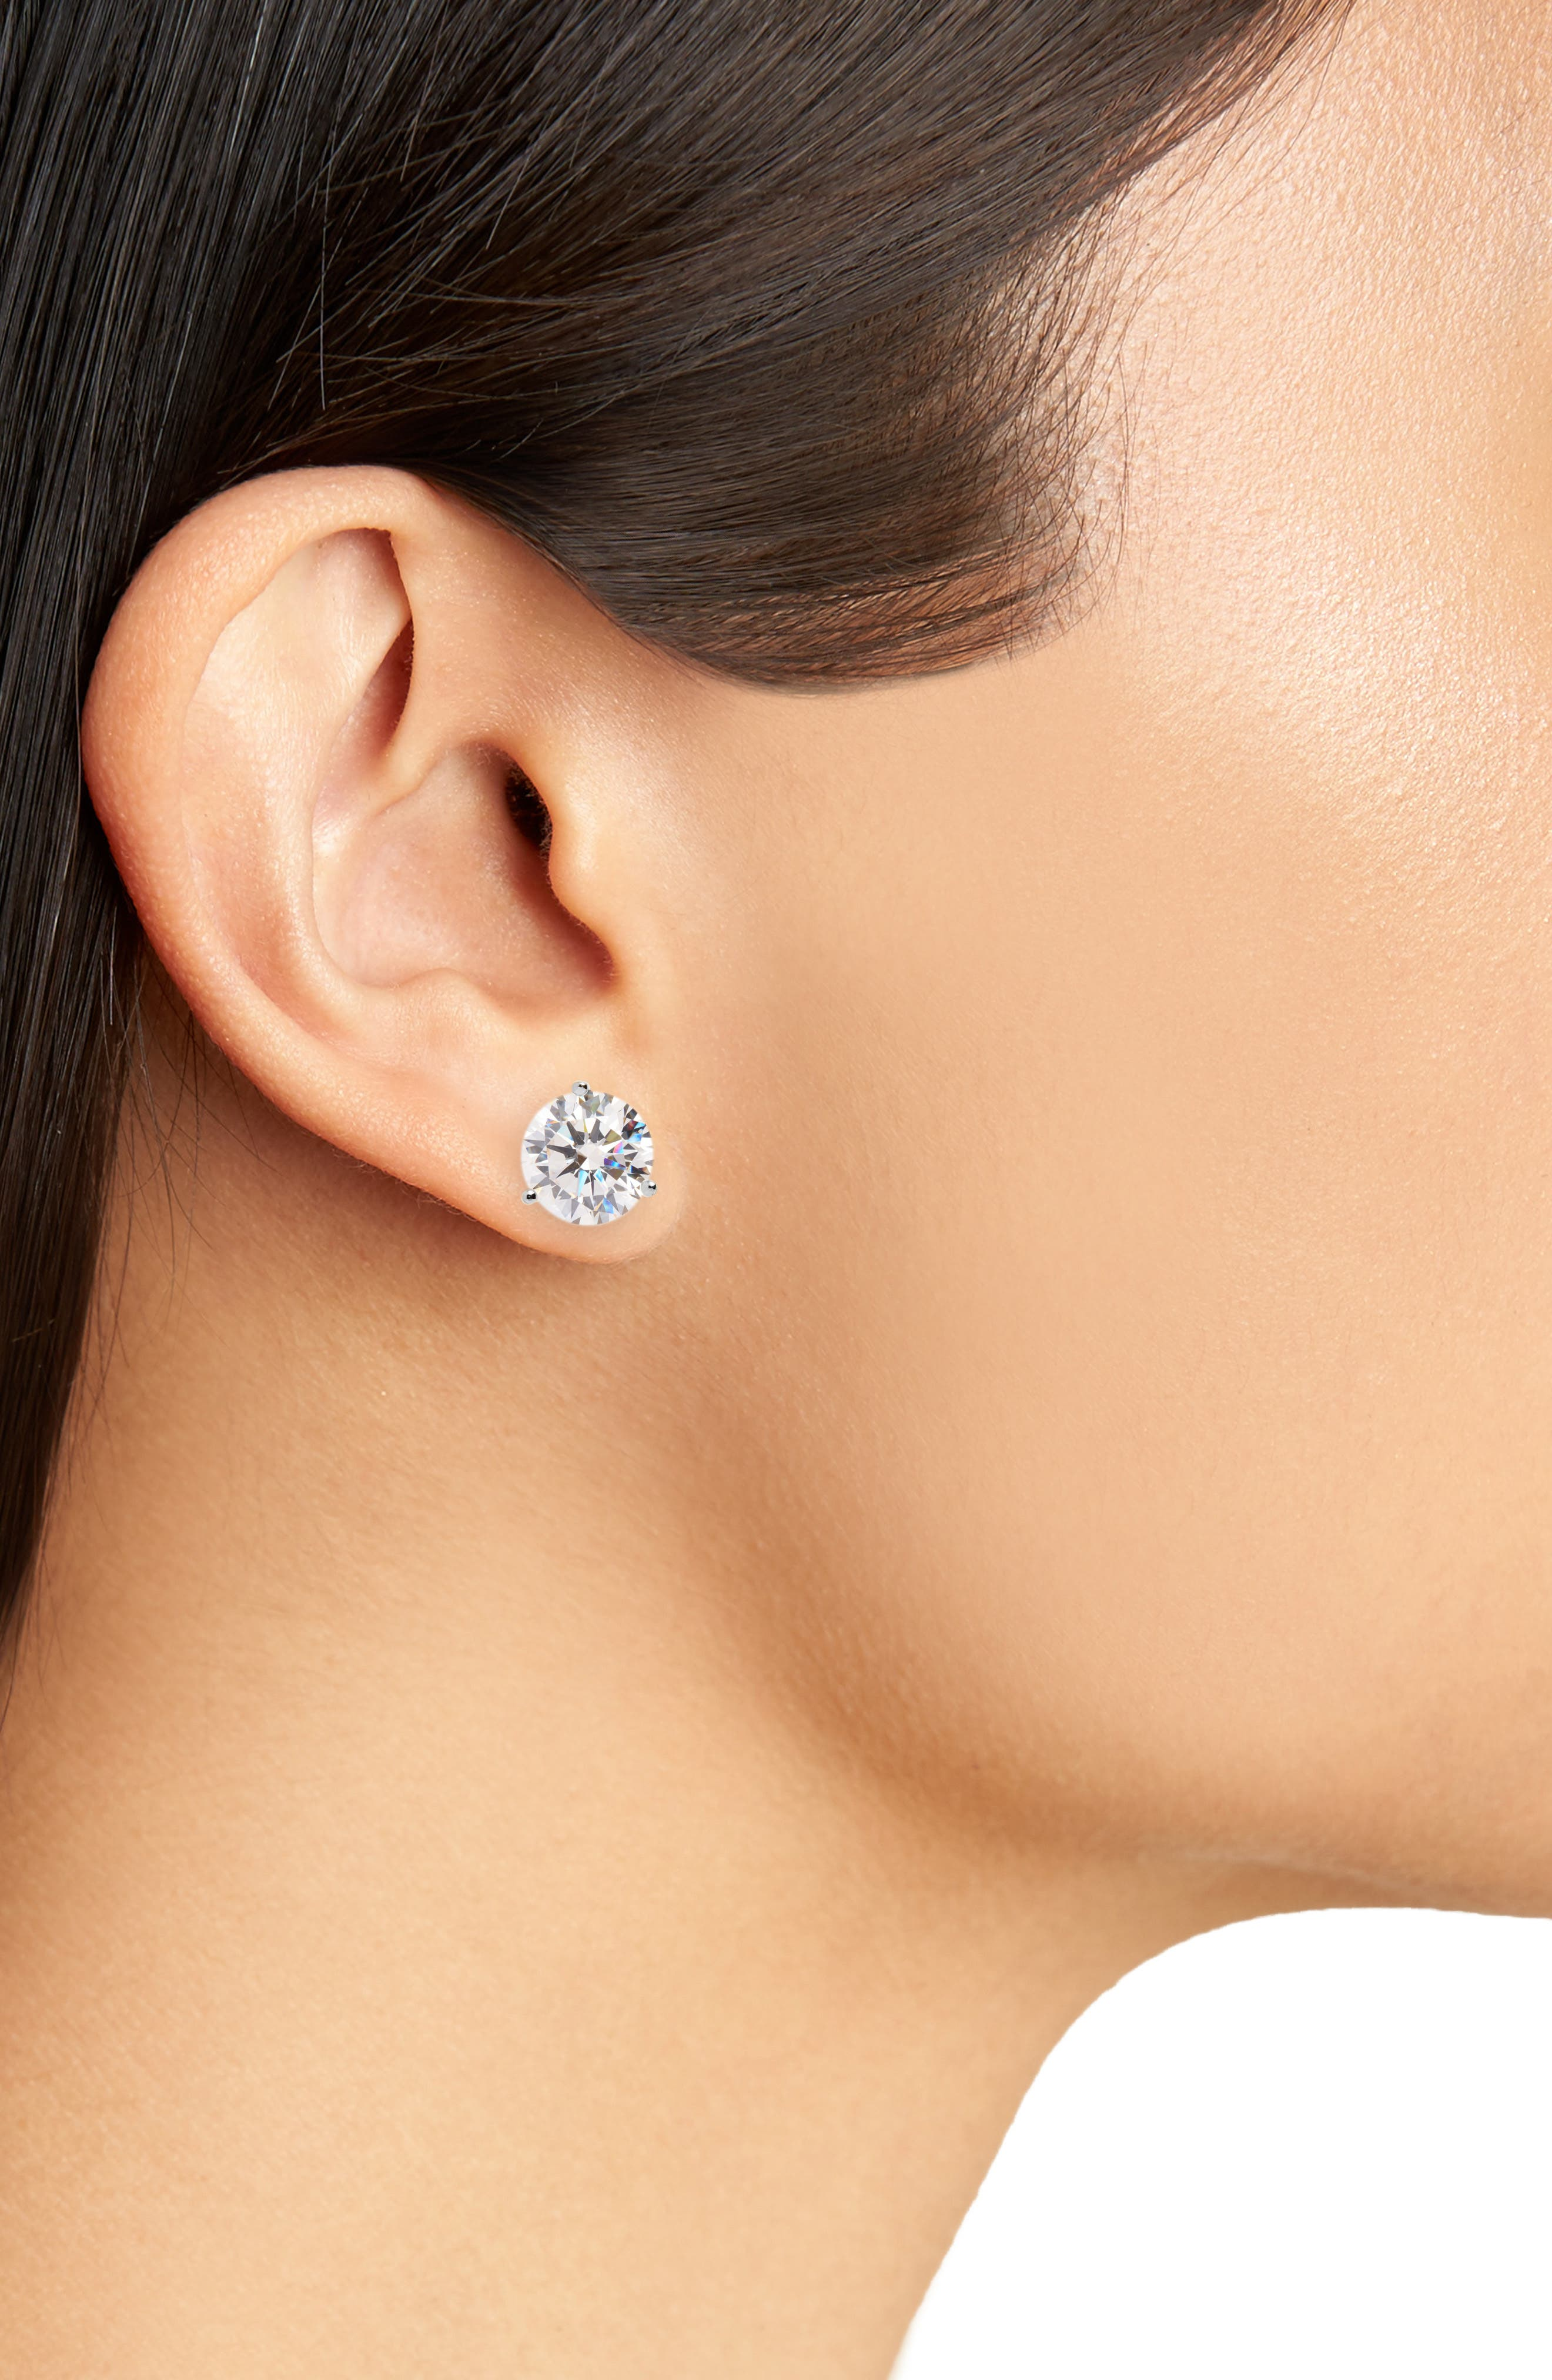 8.0ct tw Cubic Zirconia Earrings,                             Alternate thumbnail 2, color,                             PLATINUM